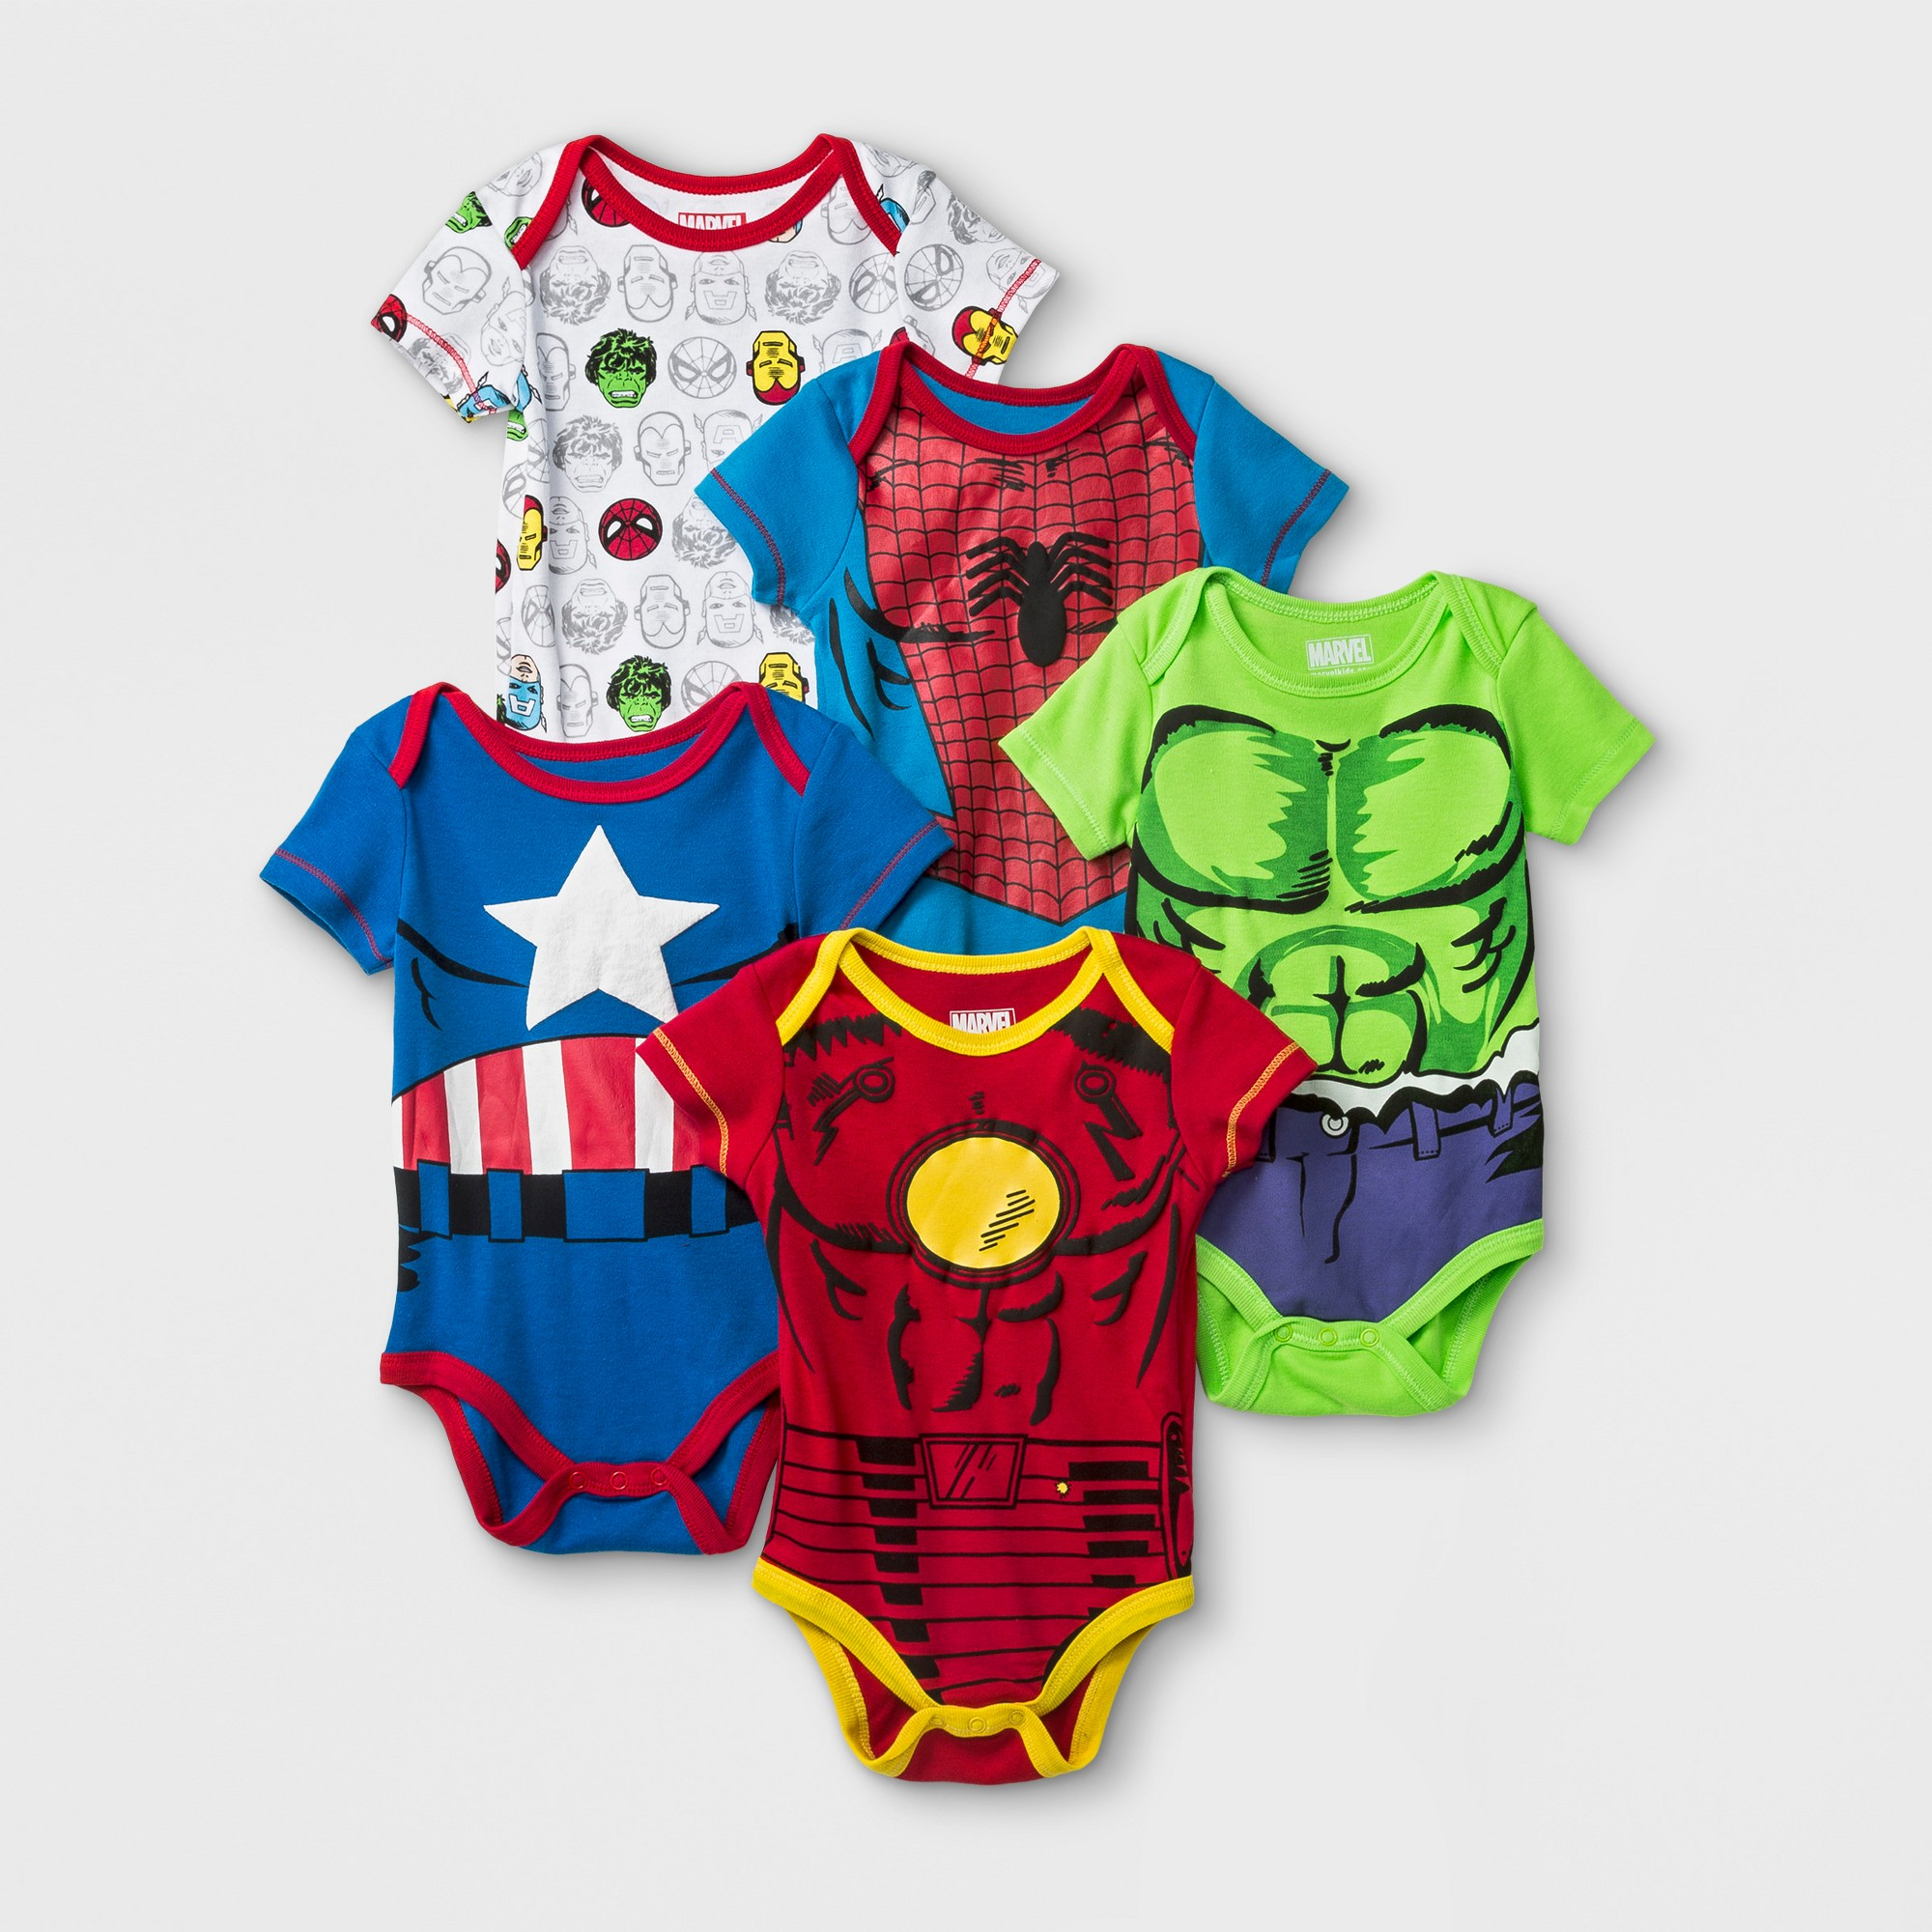 BABY SUPERHEROES KIDS HOODY CUTE IRON AVENGER HULK THOR MAN COMIC COOL BOYS